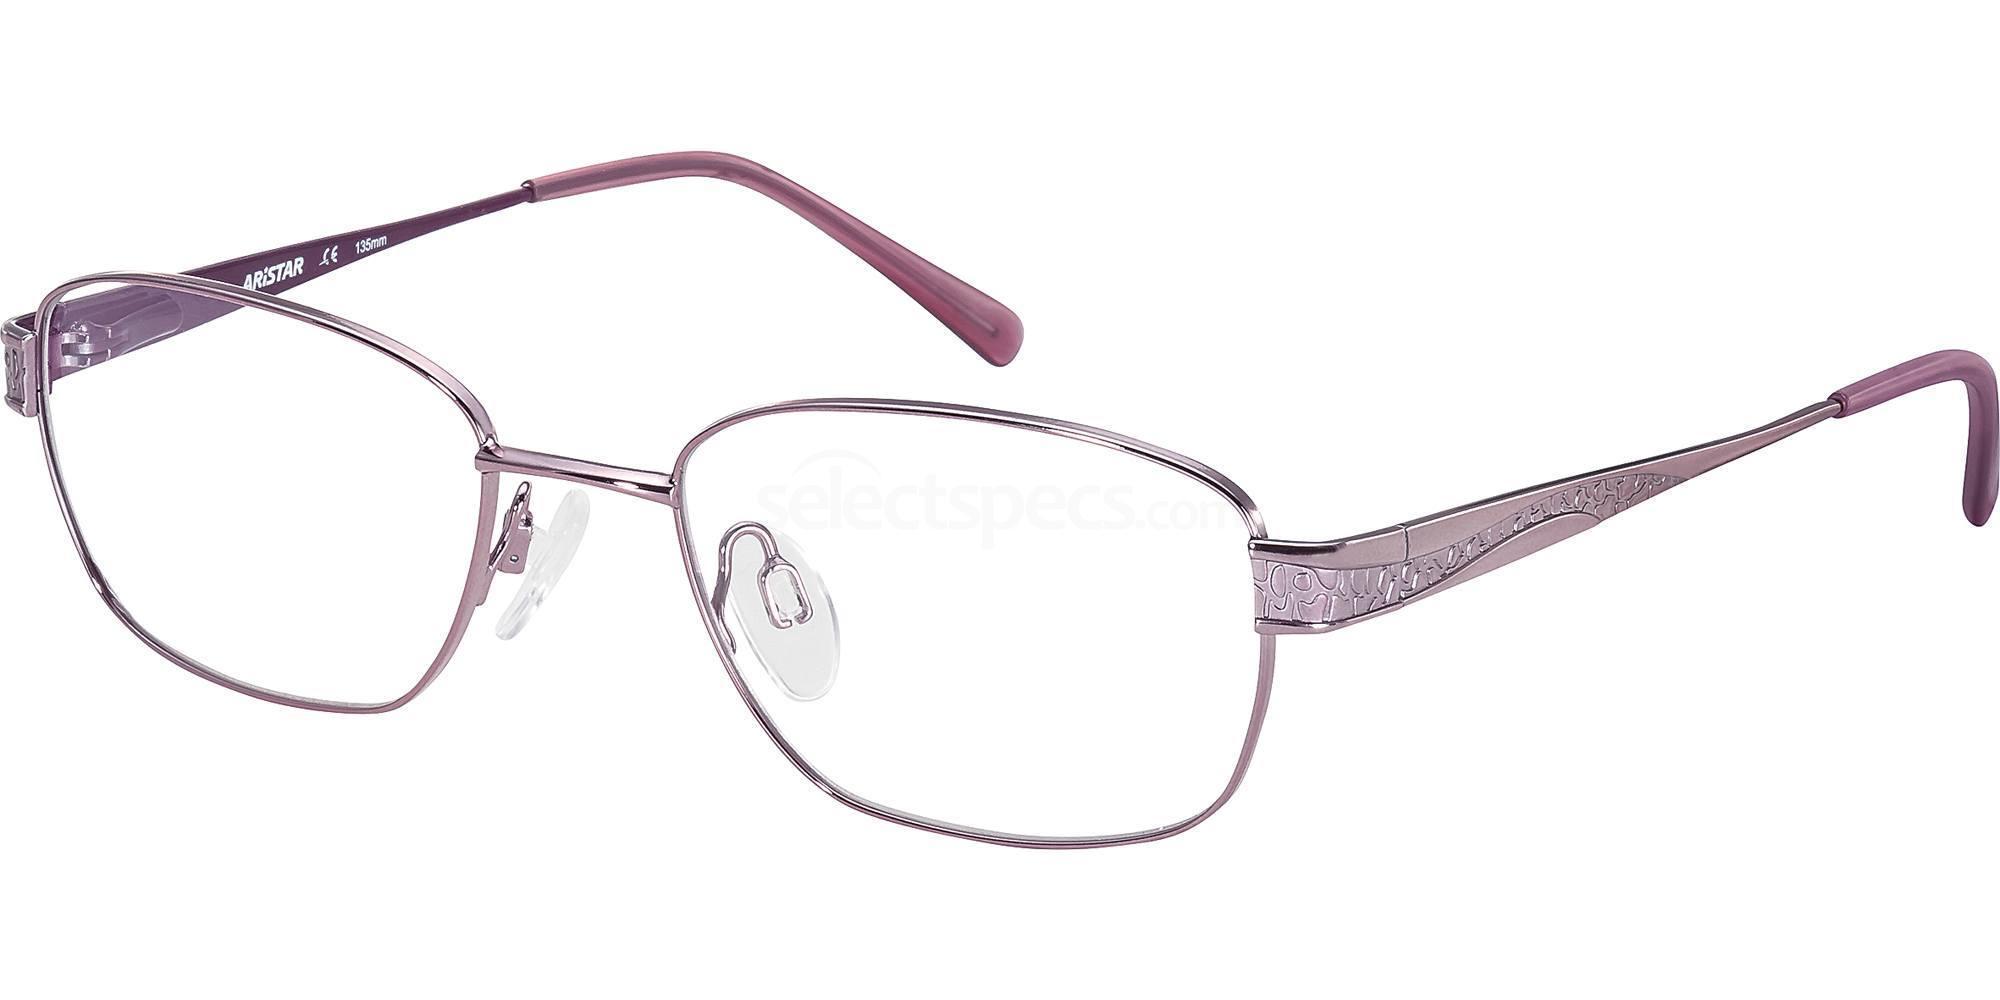 534 AR16351 Glasses, Aristar